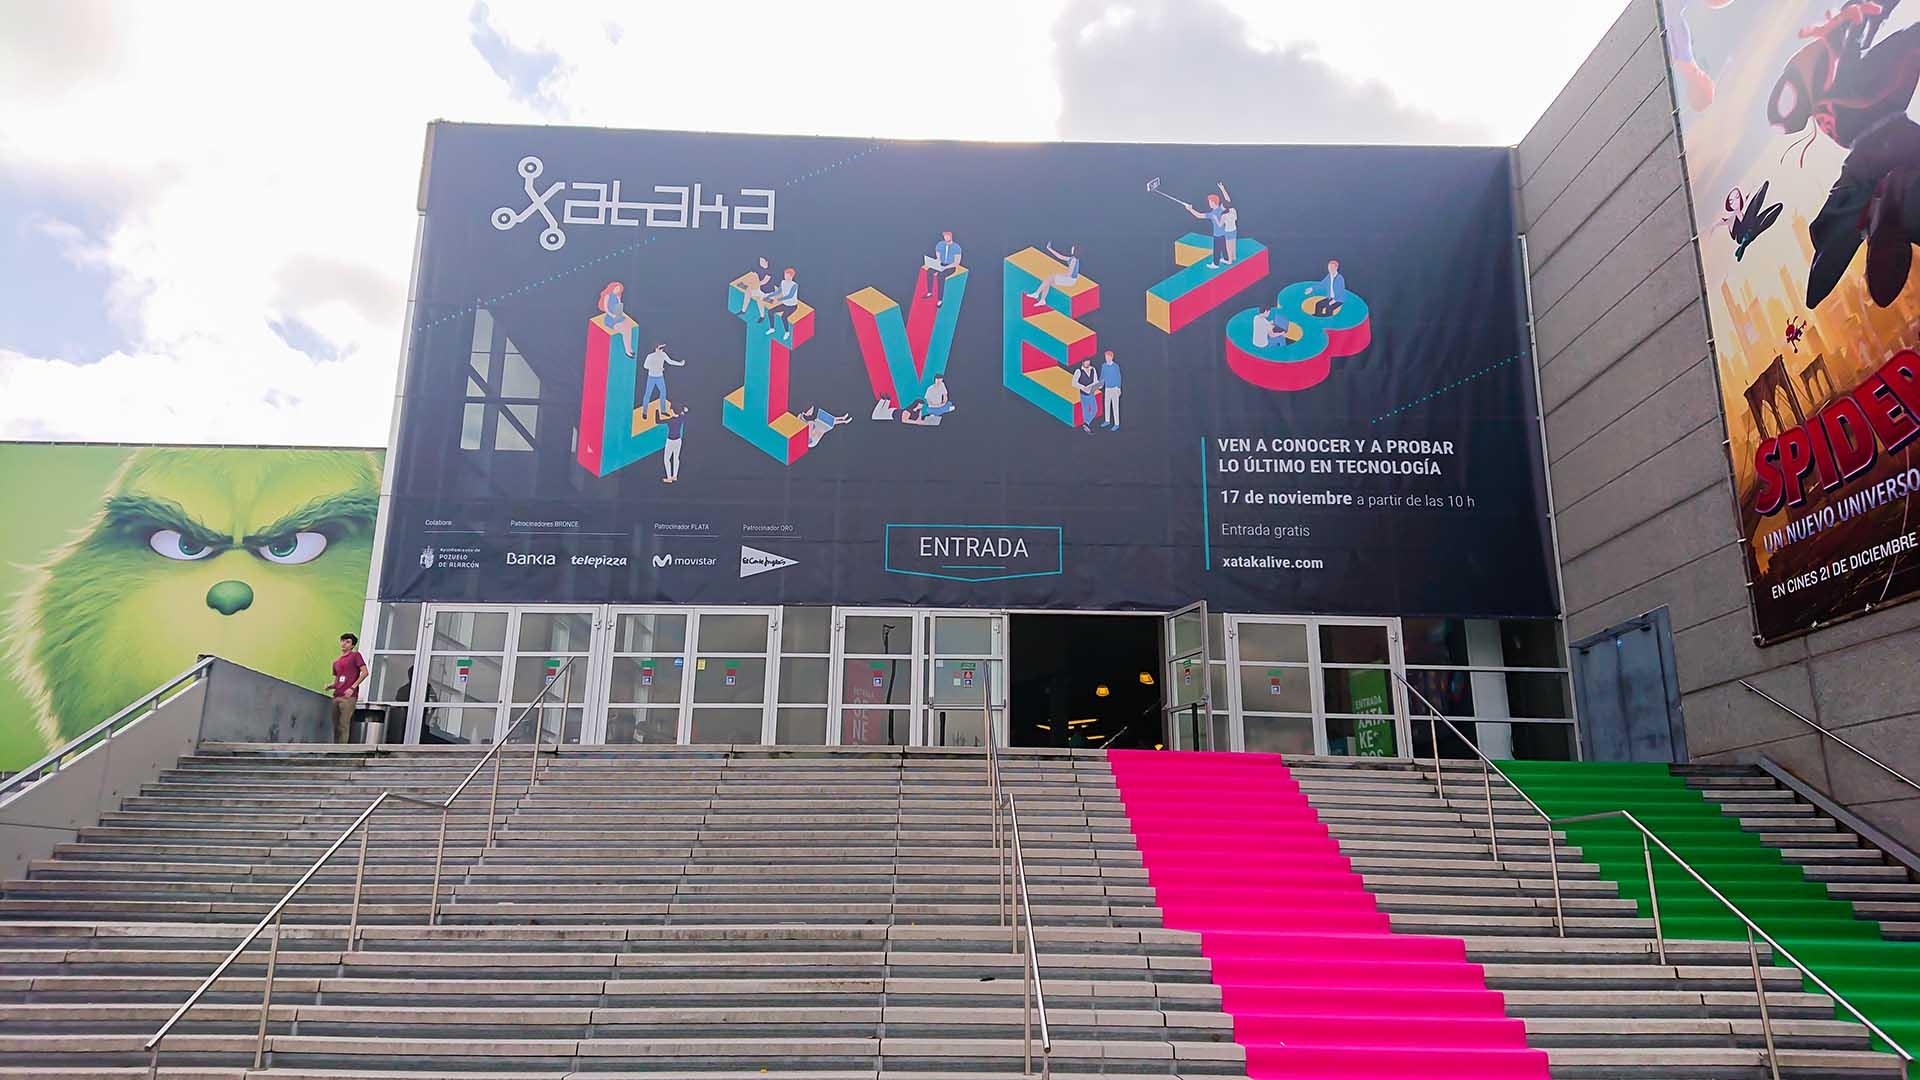 Xataca awards presentation event. Access area design